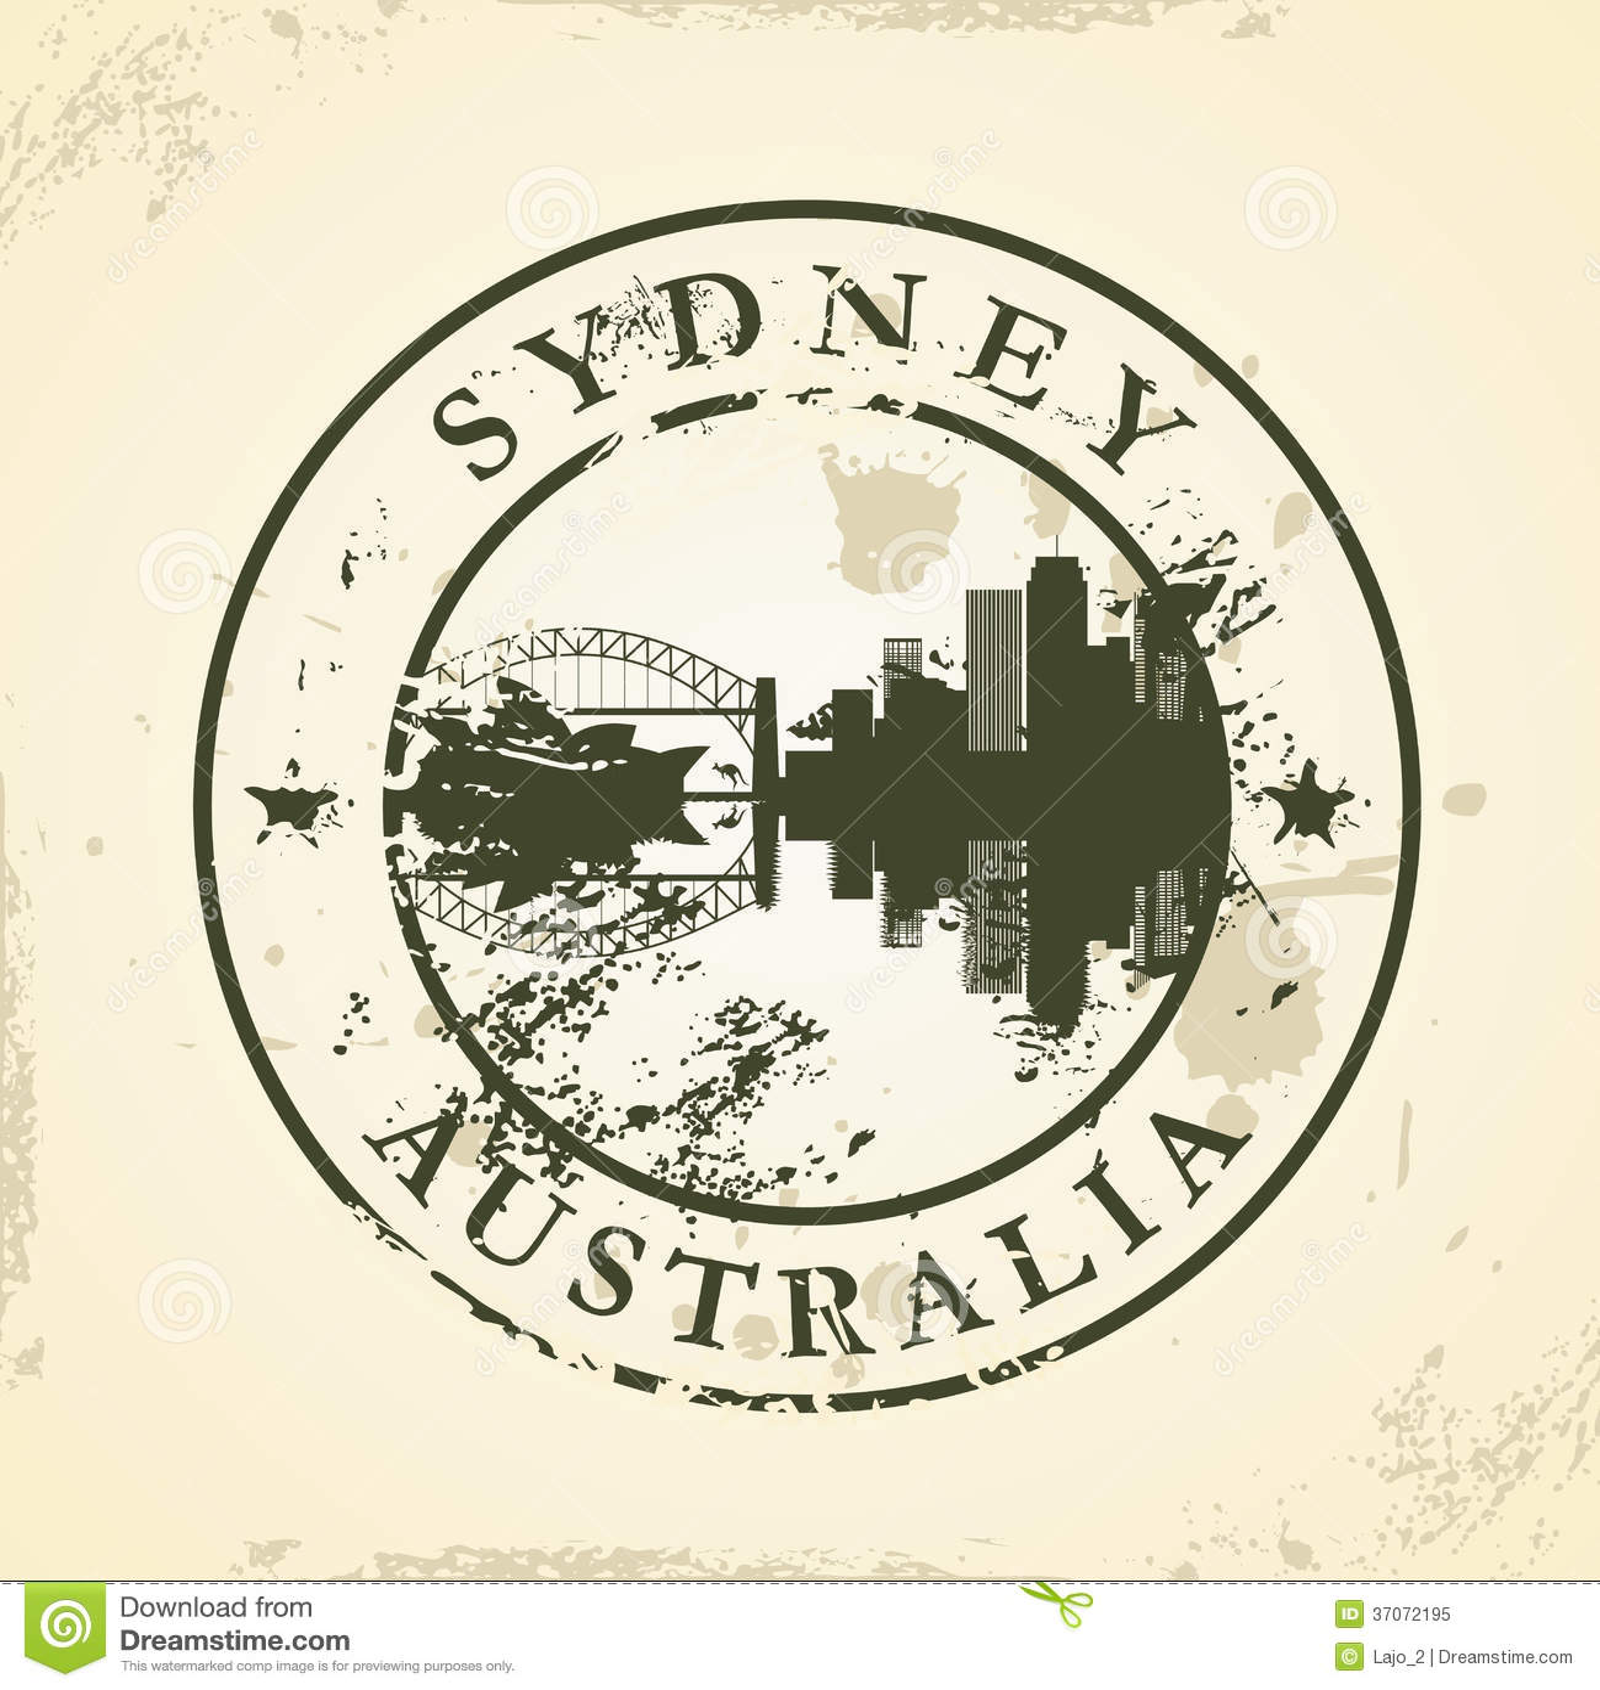 stamp collectors sydney australia time - photo#6